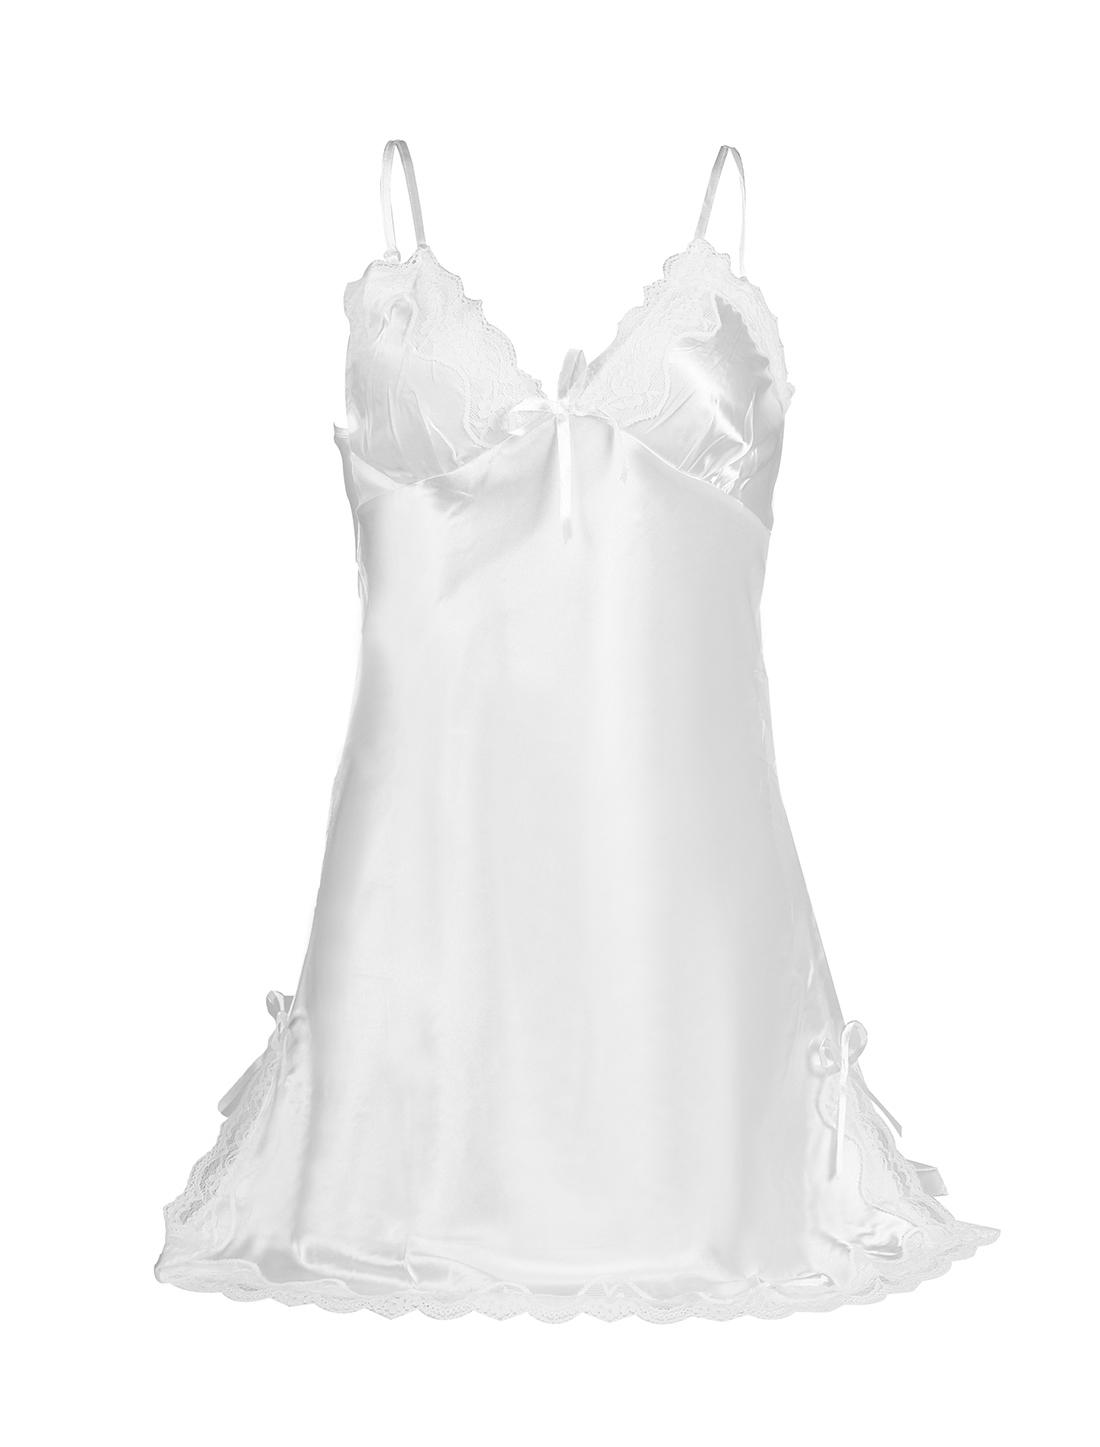 Women Sexy Satin Lace Trim Sleepwear Nightgown Pajama Slip Dress White-Lace M